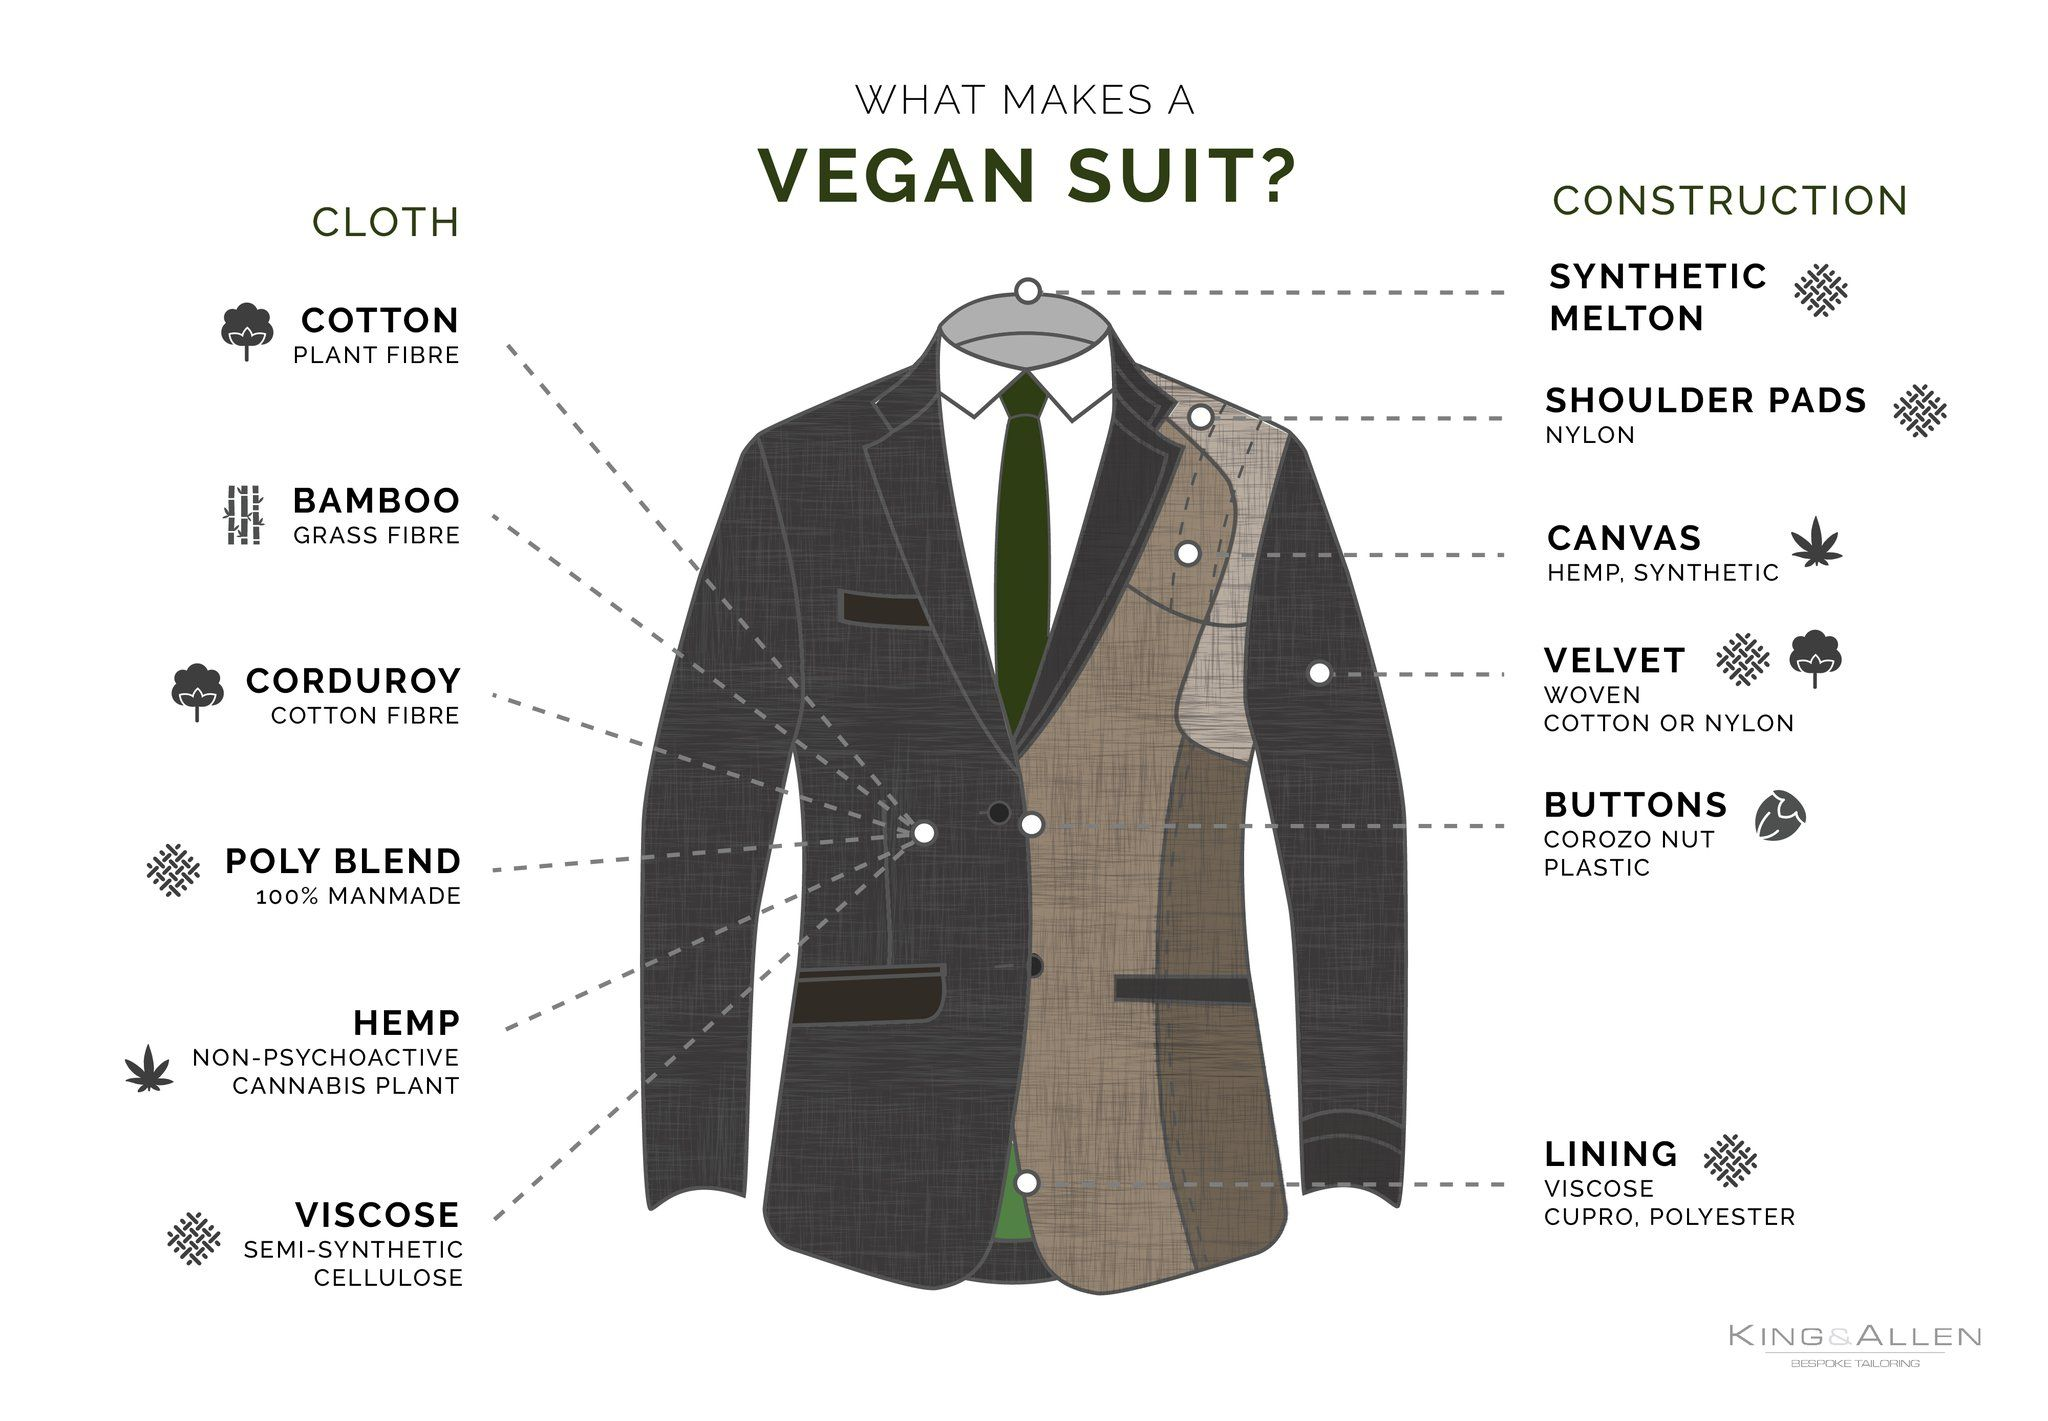 Vegan Suit? | Suits, Vegan, Vegan shoes